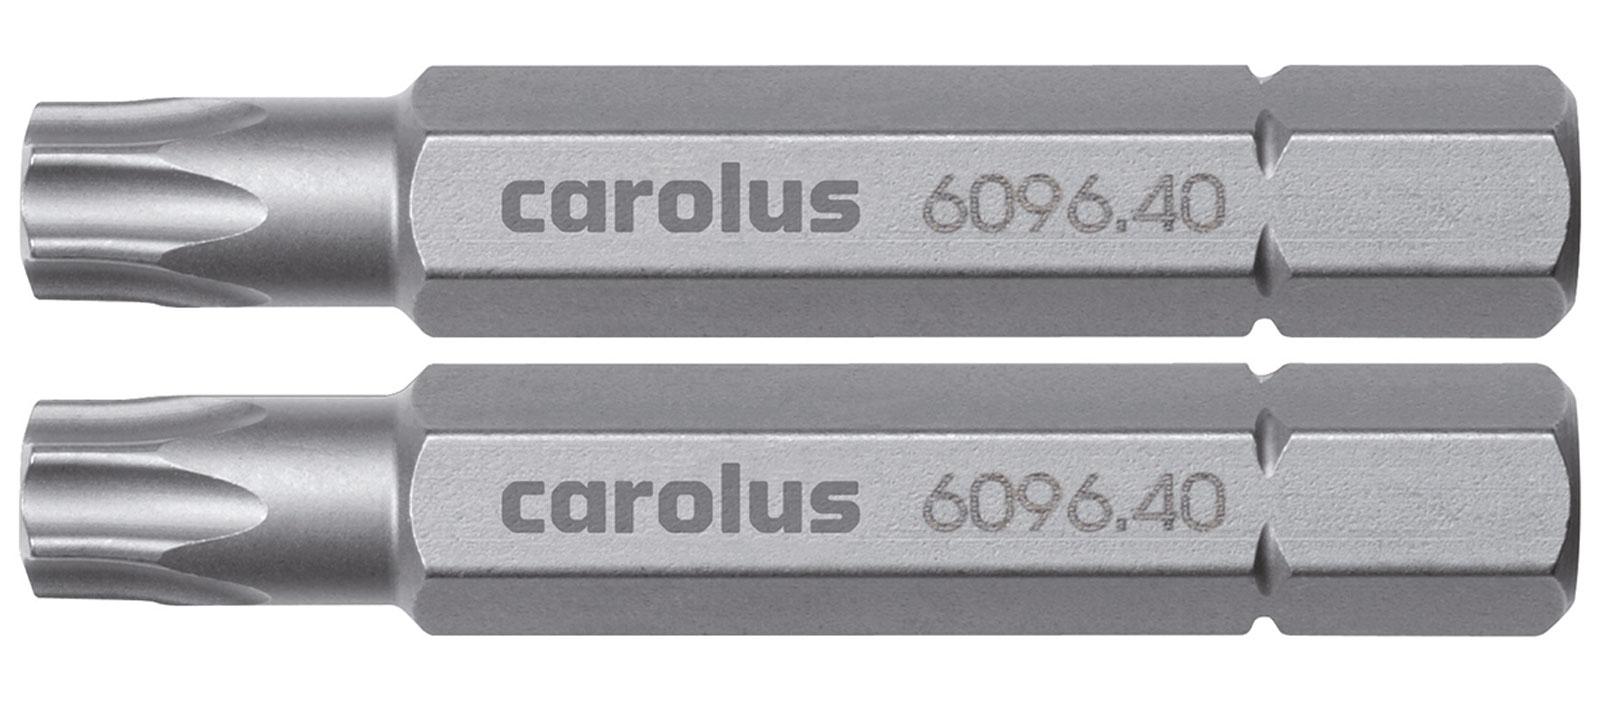 carolus bit 5 16 50 mm lang torx mit stift txb20. Black Bedroom Furniture Sets. Home Design Ideas